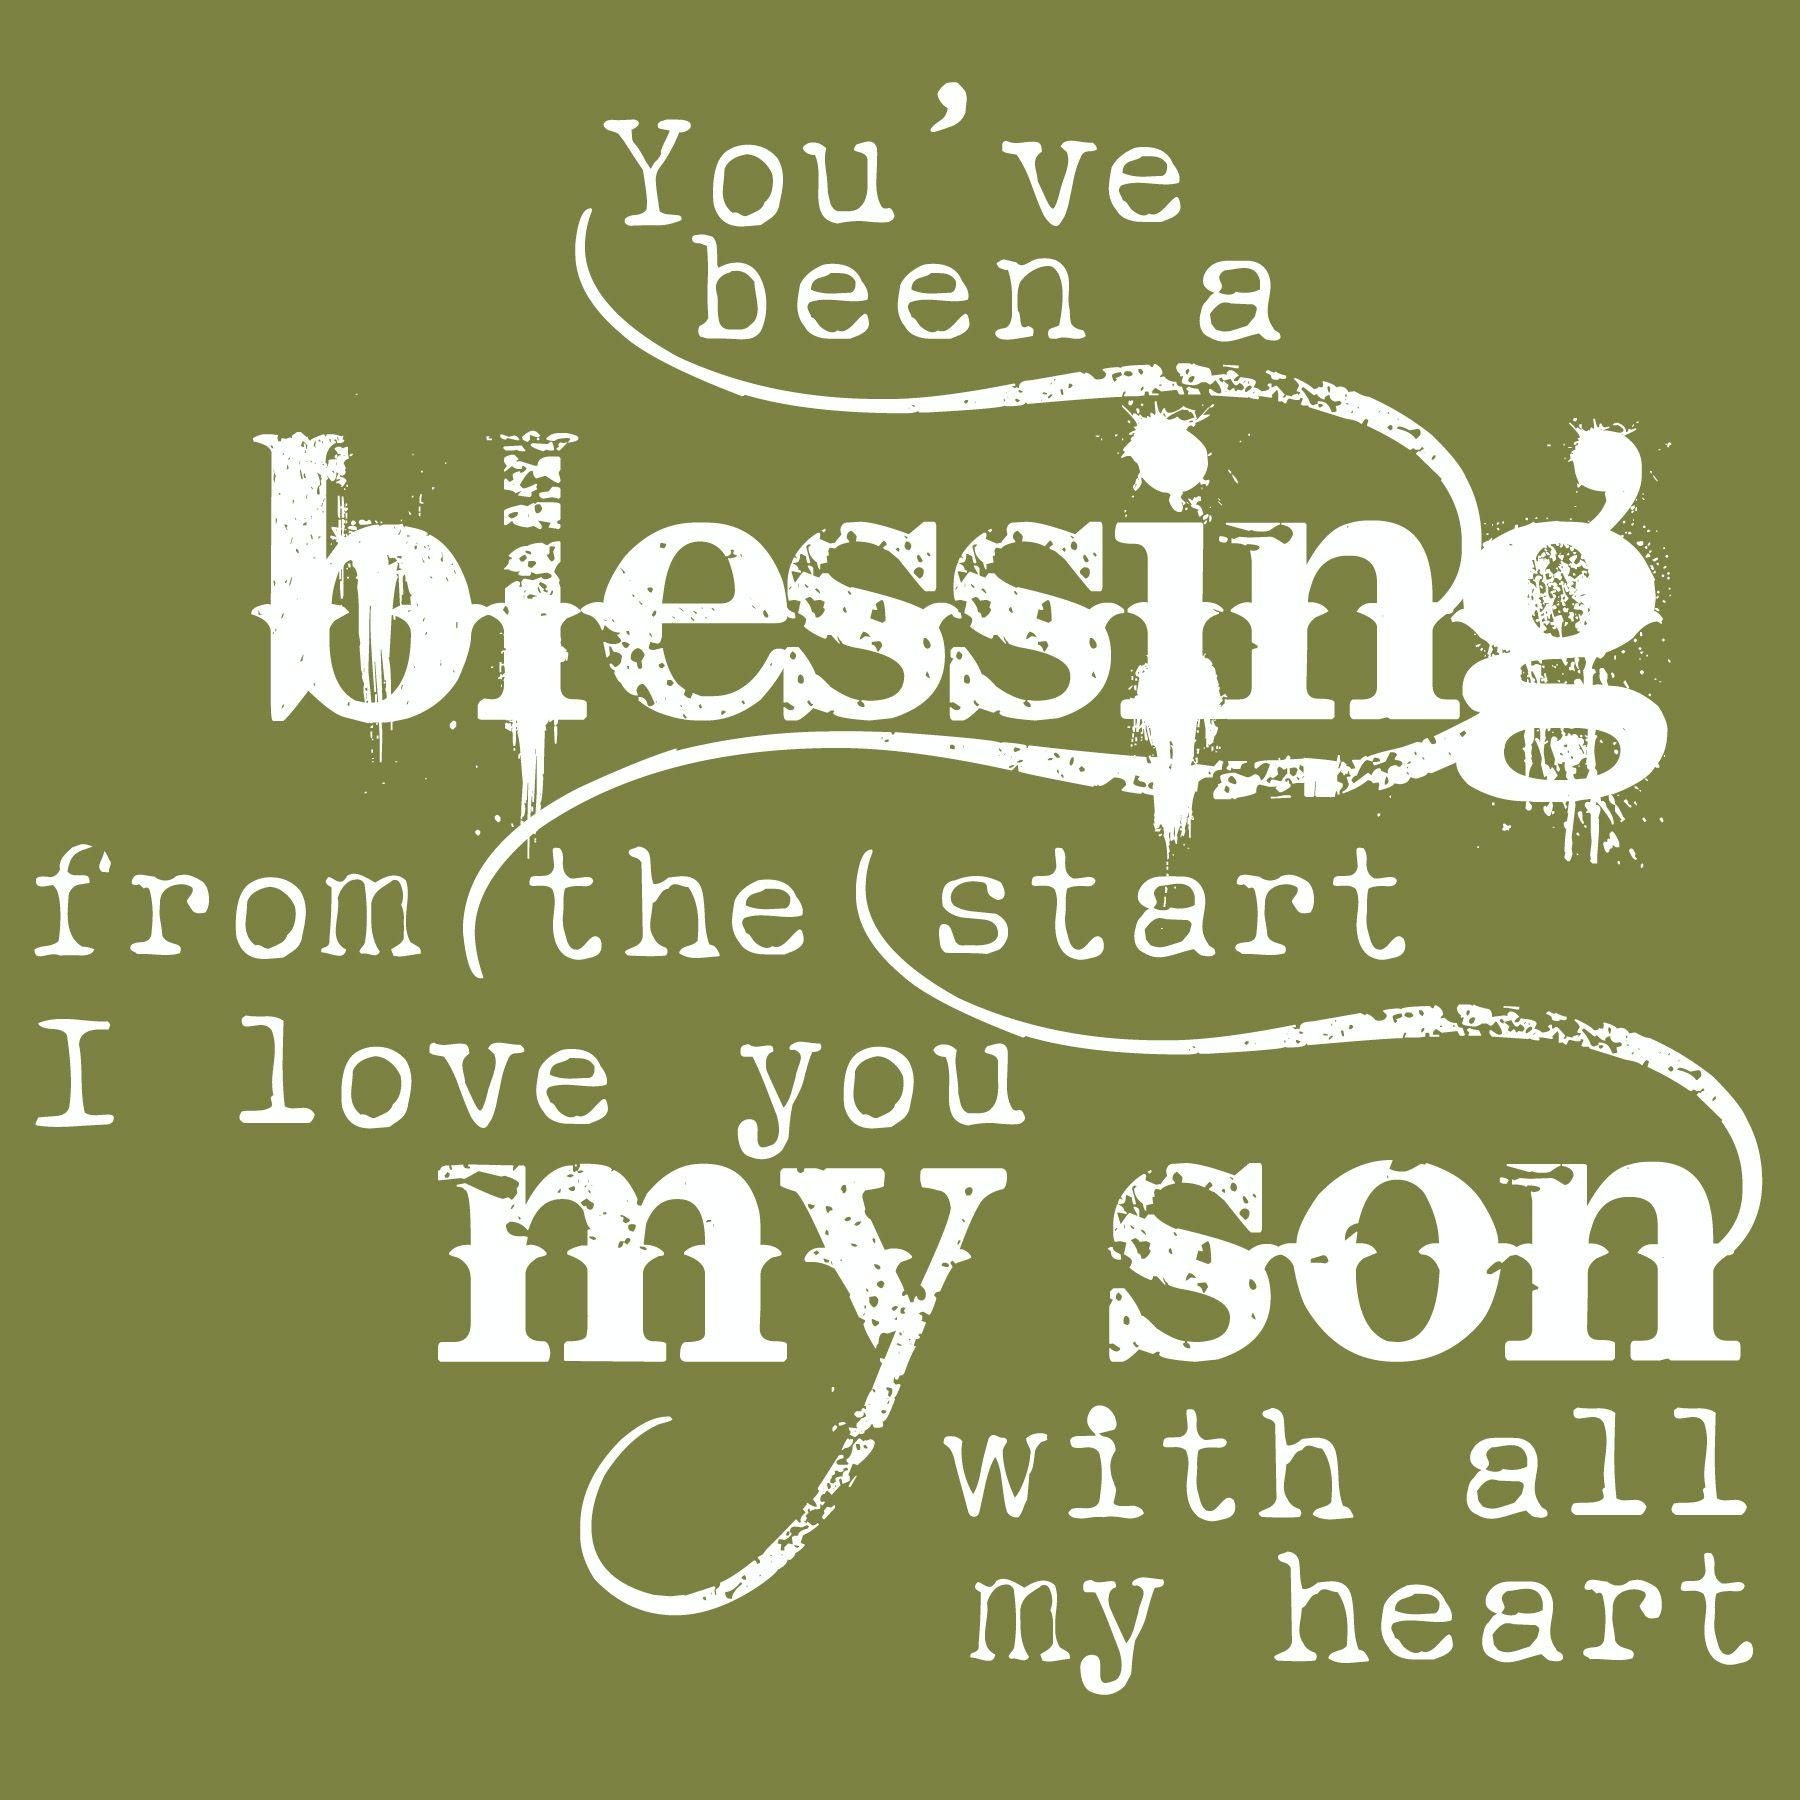 Love My Son Quotes 6A00E54F79Fbd888330133Ed1C7A9B970Bpi 1800×1800 Pixels  1St